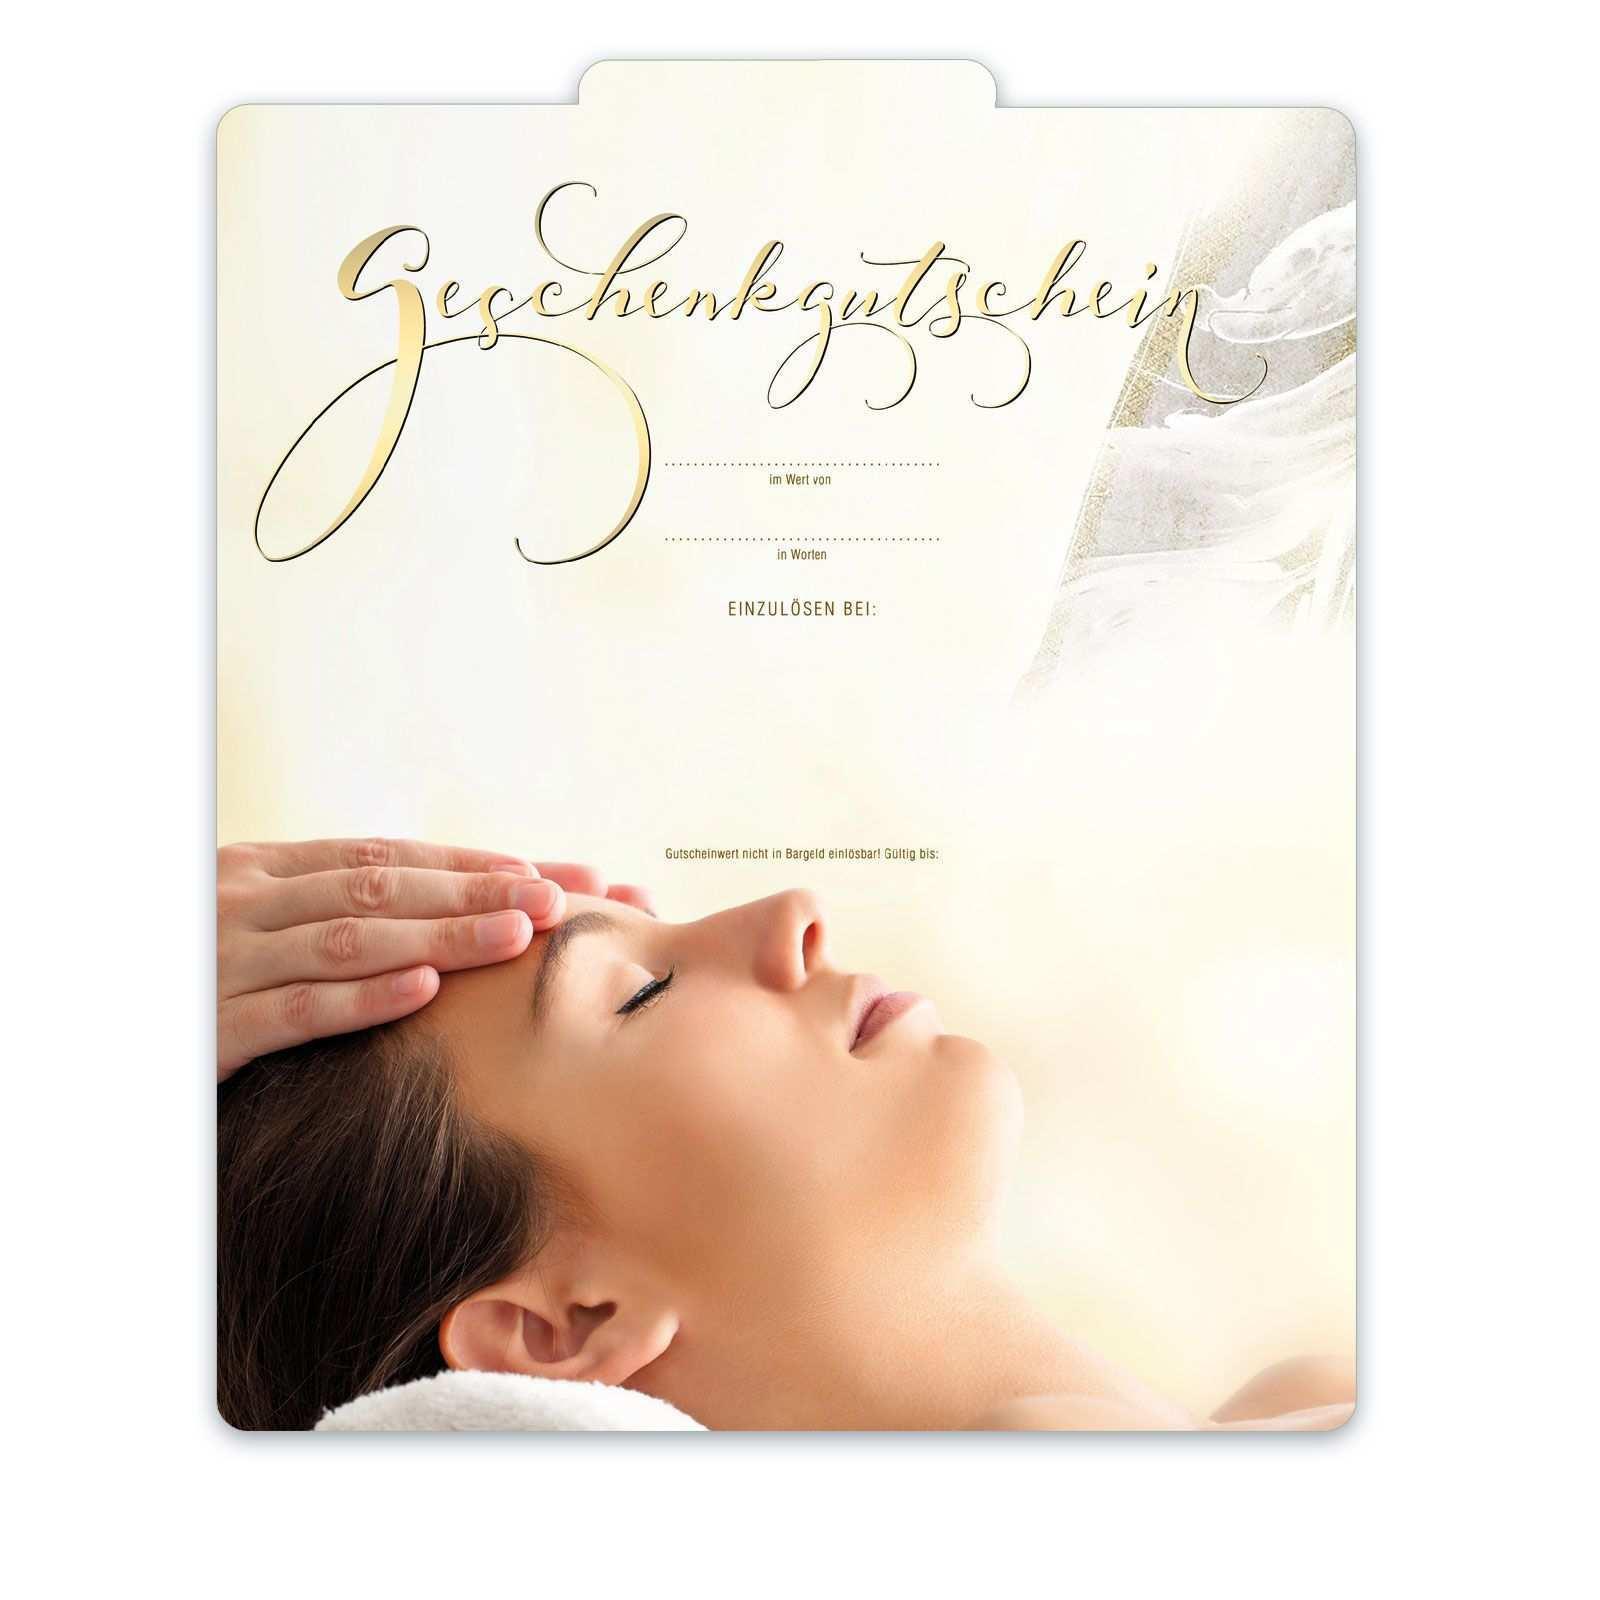 Faltgutschein Multicolor Ma258 Fur Wellness Massage Spa Wellness Gutschein Gutscheine Geschenkgutscheine